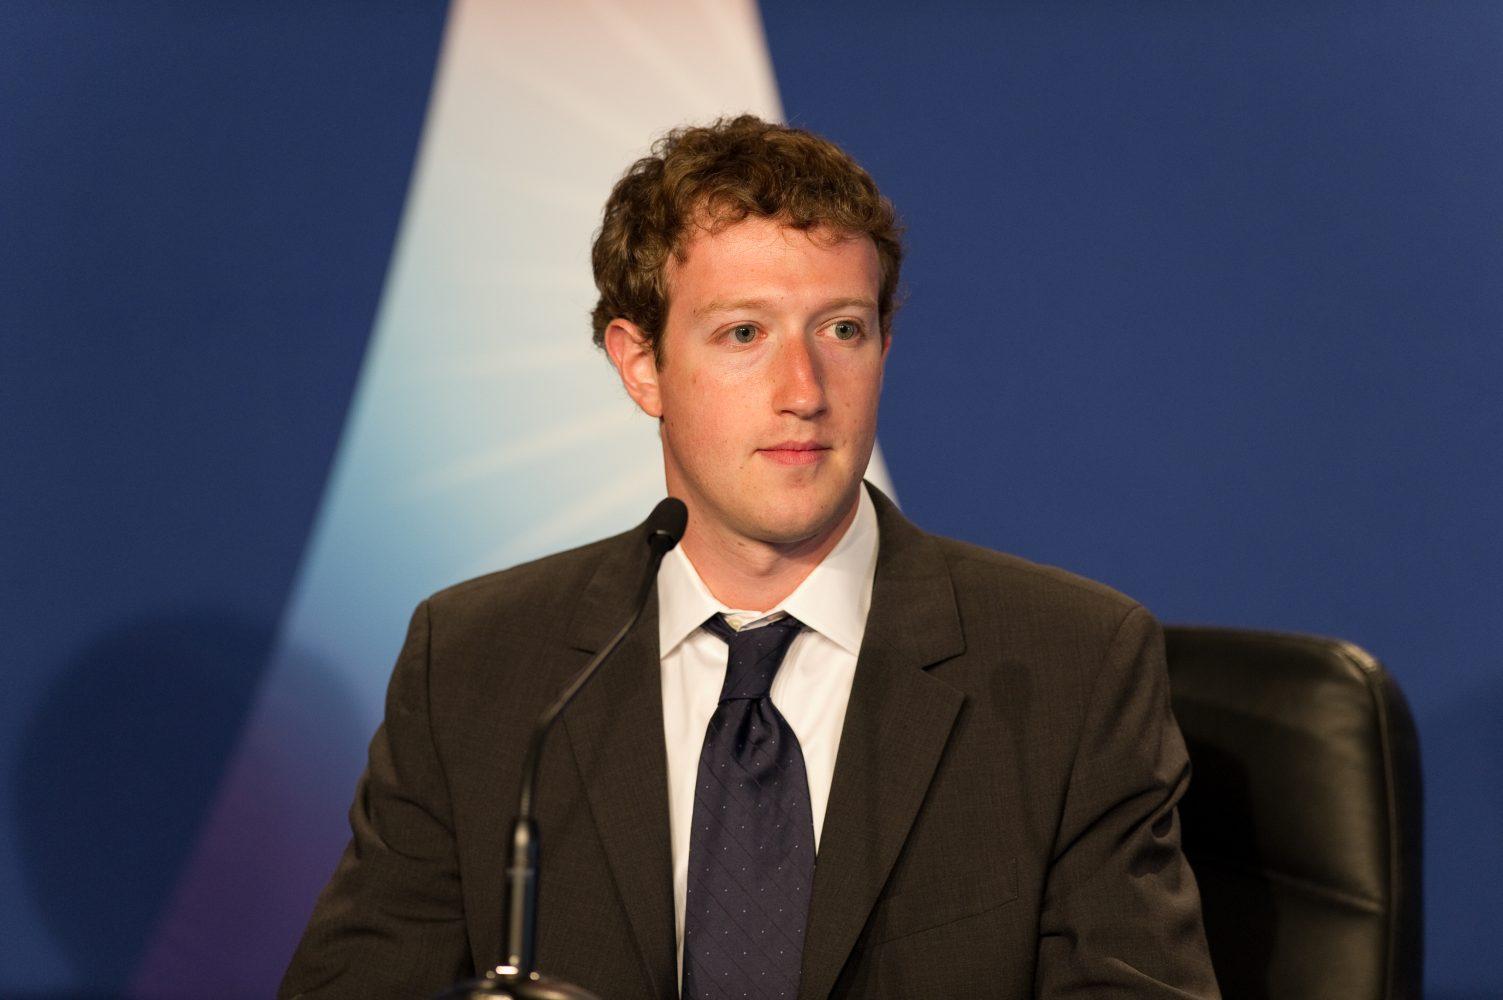 US Senators Seek Information on Facebook's 'Libra' Crypto Project